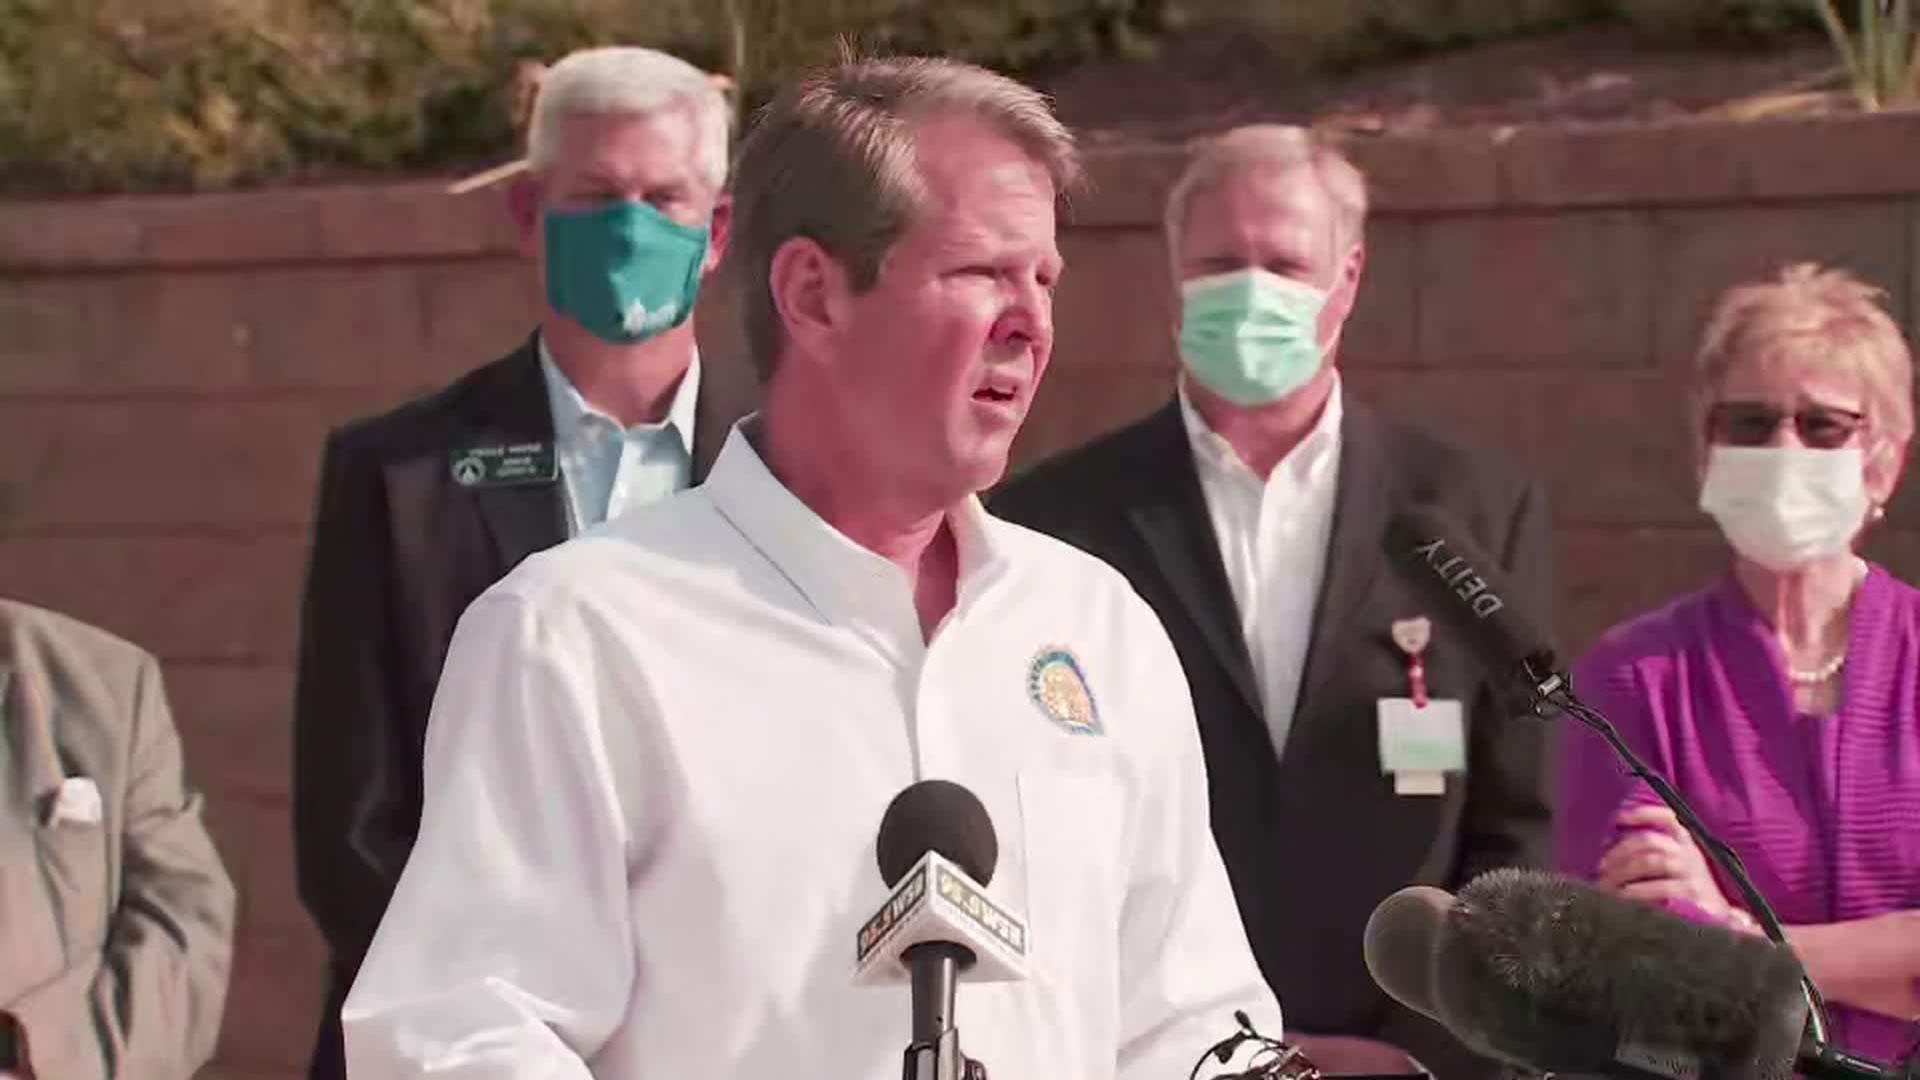 Georgia Gov. Brian Kemp speaks during a press conference in Dalton, Georgia, on July 2.